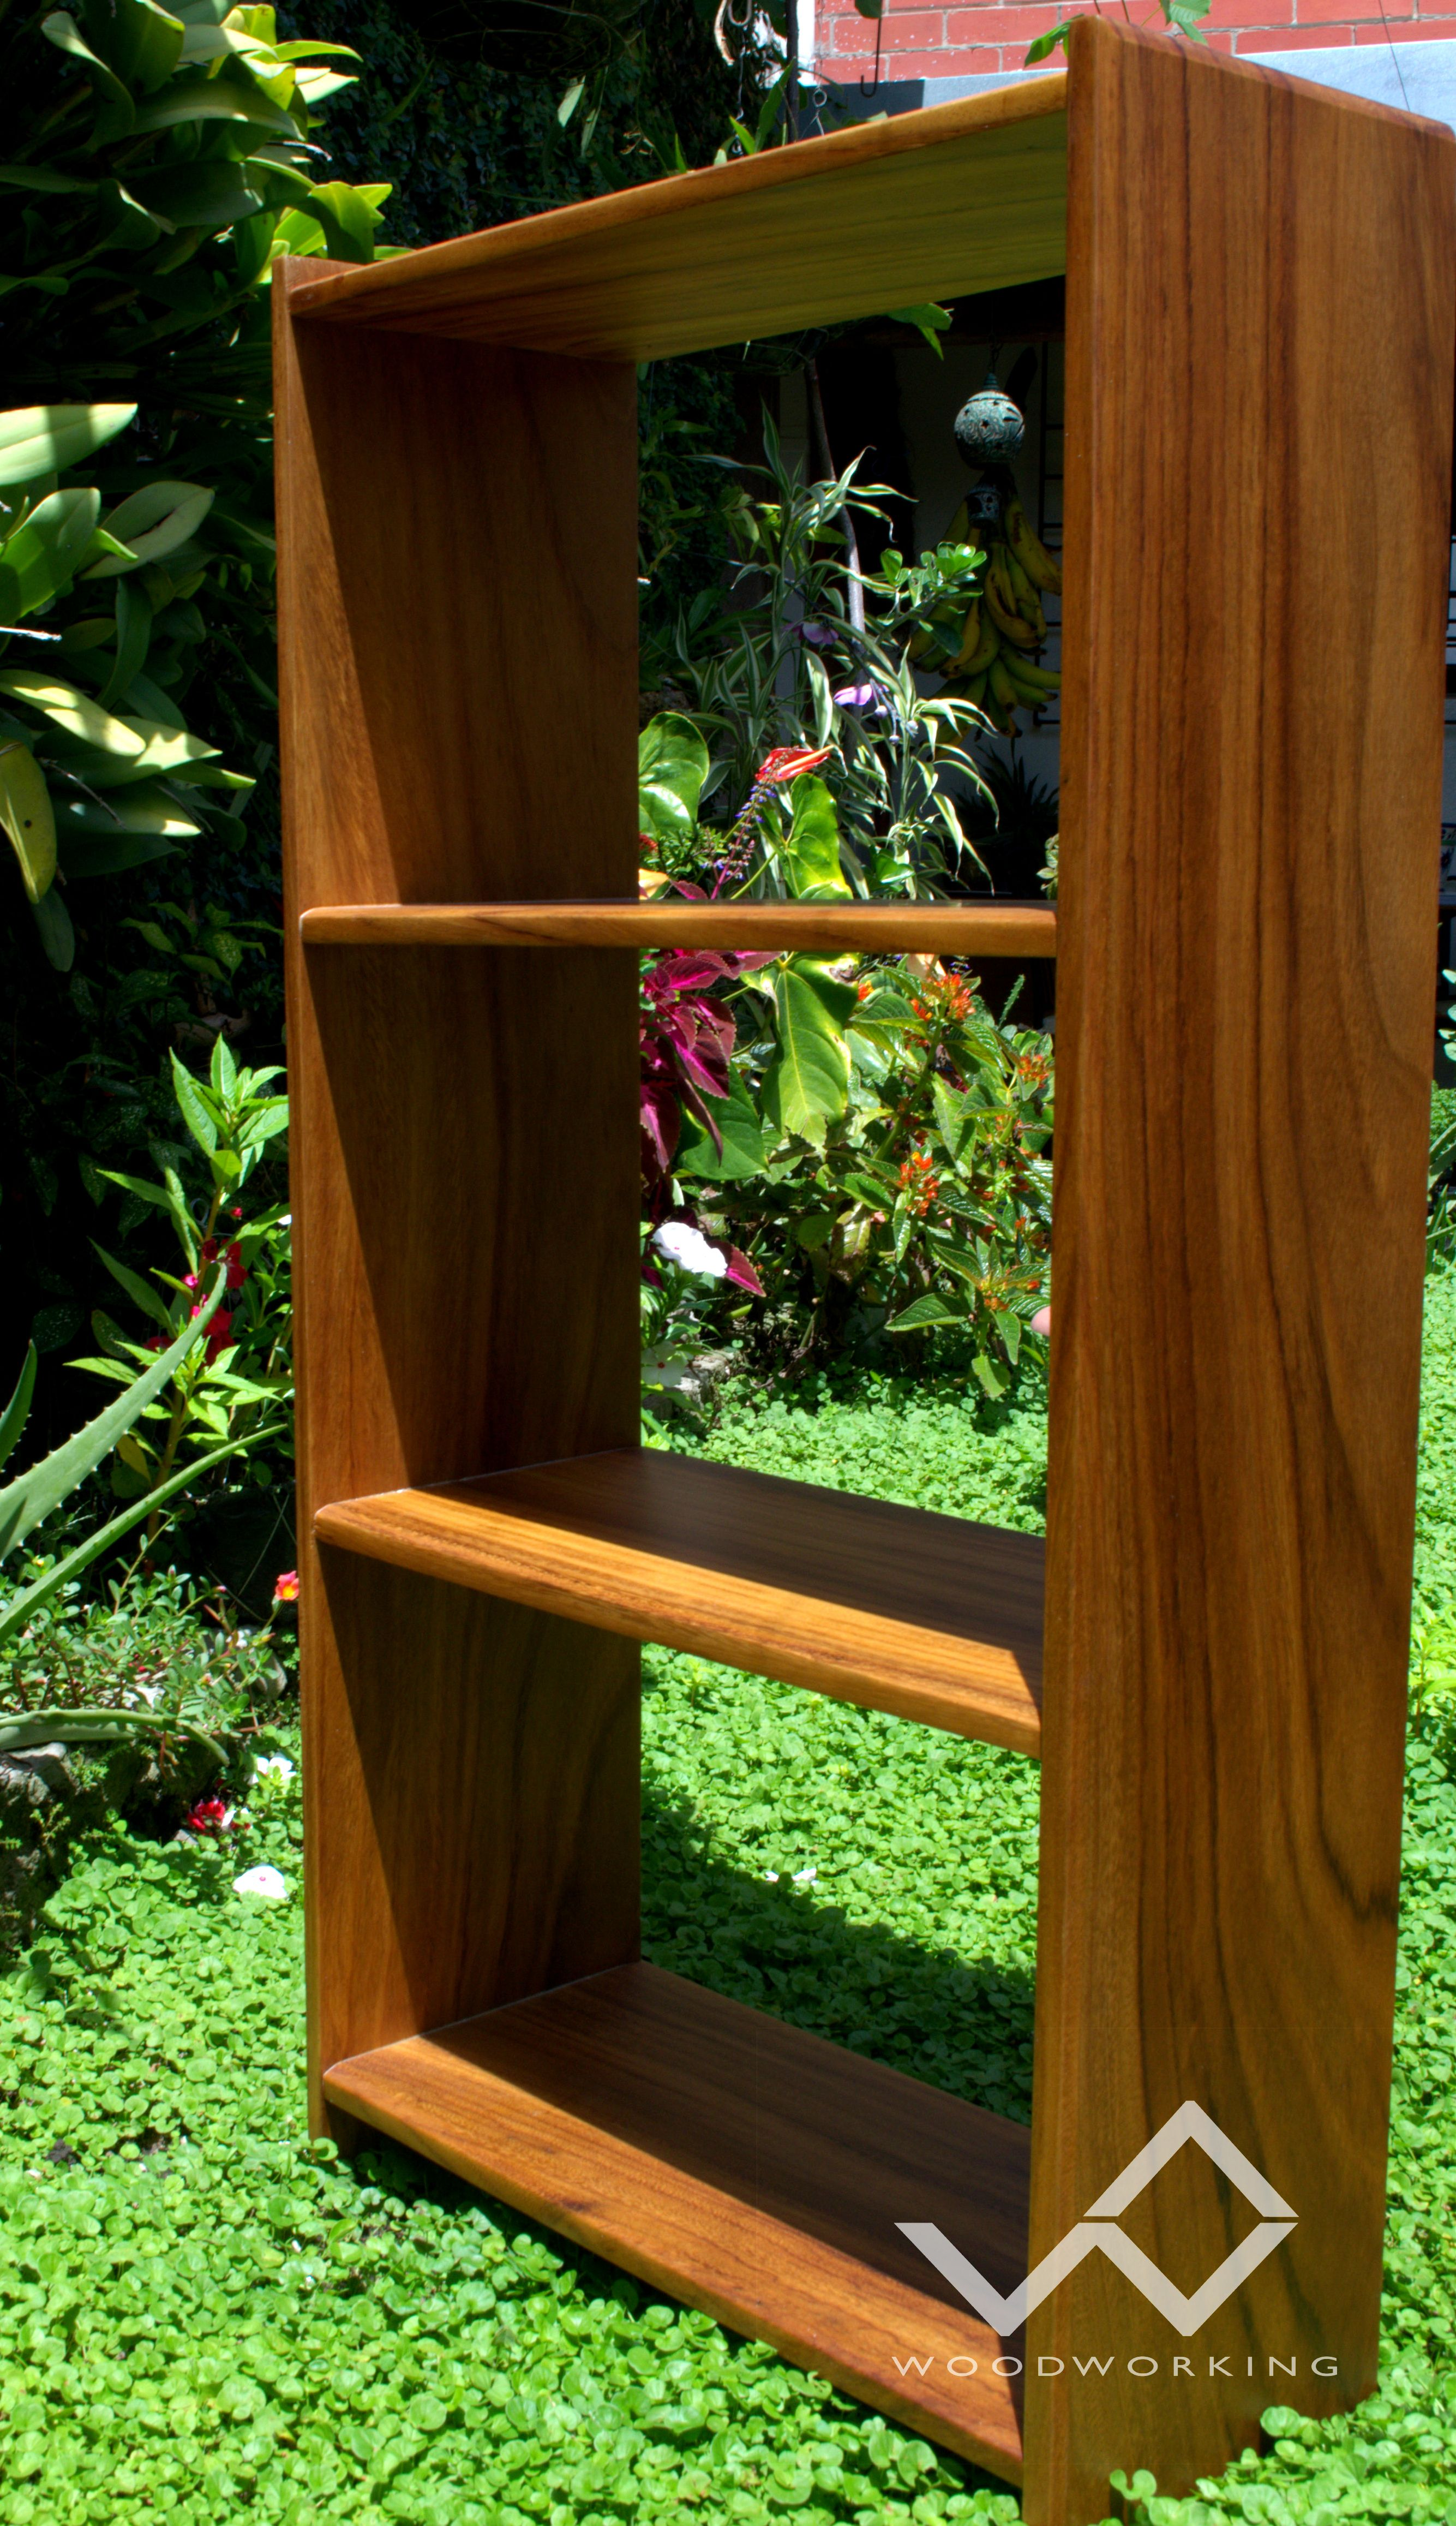 librera conacaste madera bookshelf wood furniture muebles wua